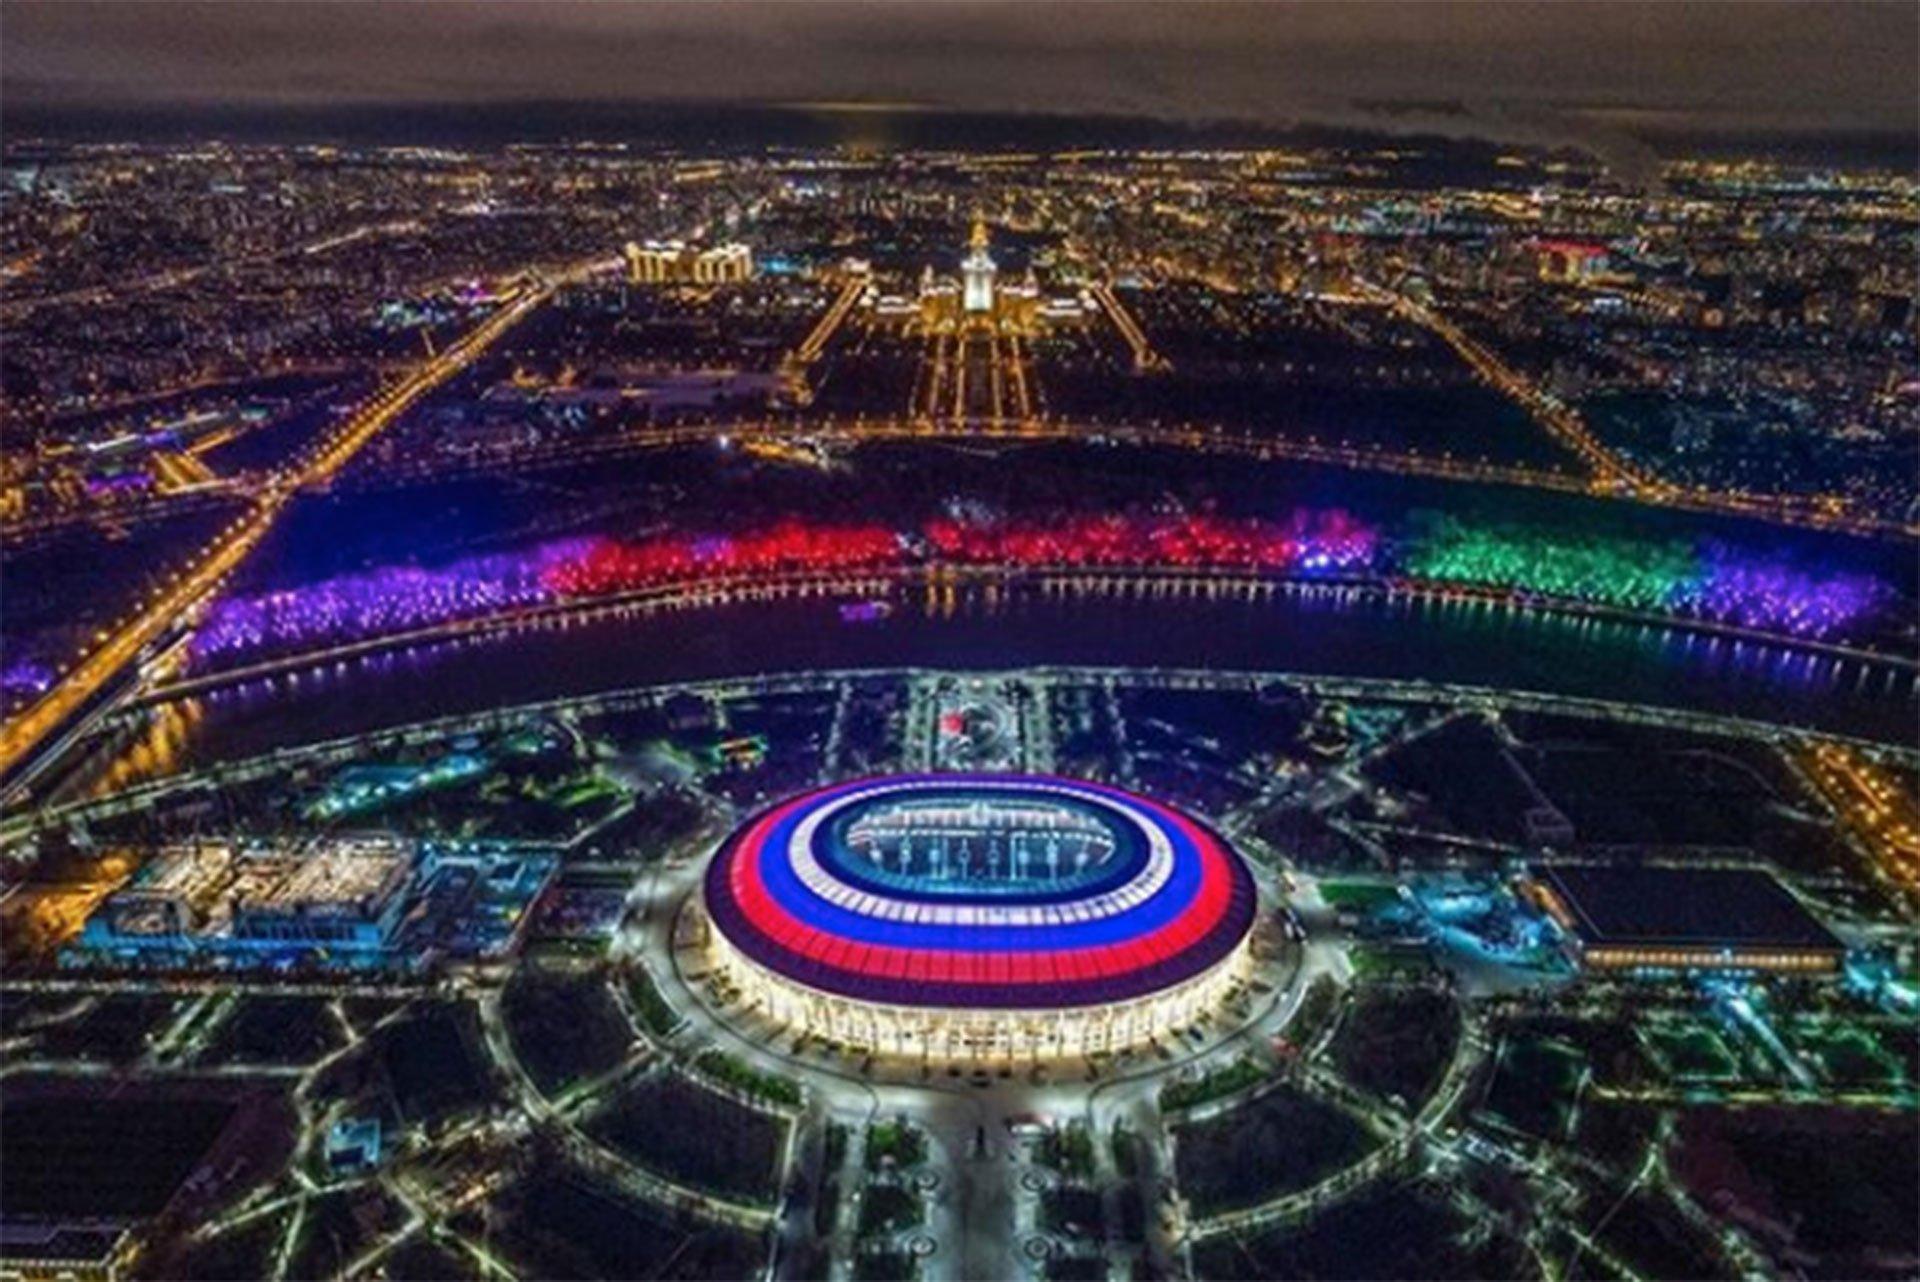 Rusia derroto 5-0 a Arabia Saudita en Rusia 2018